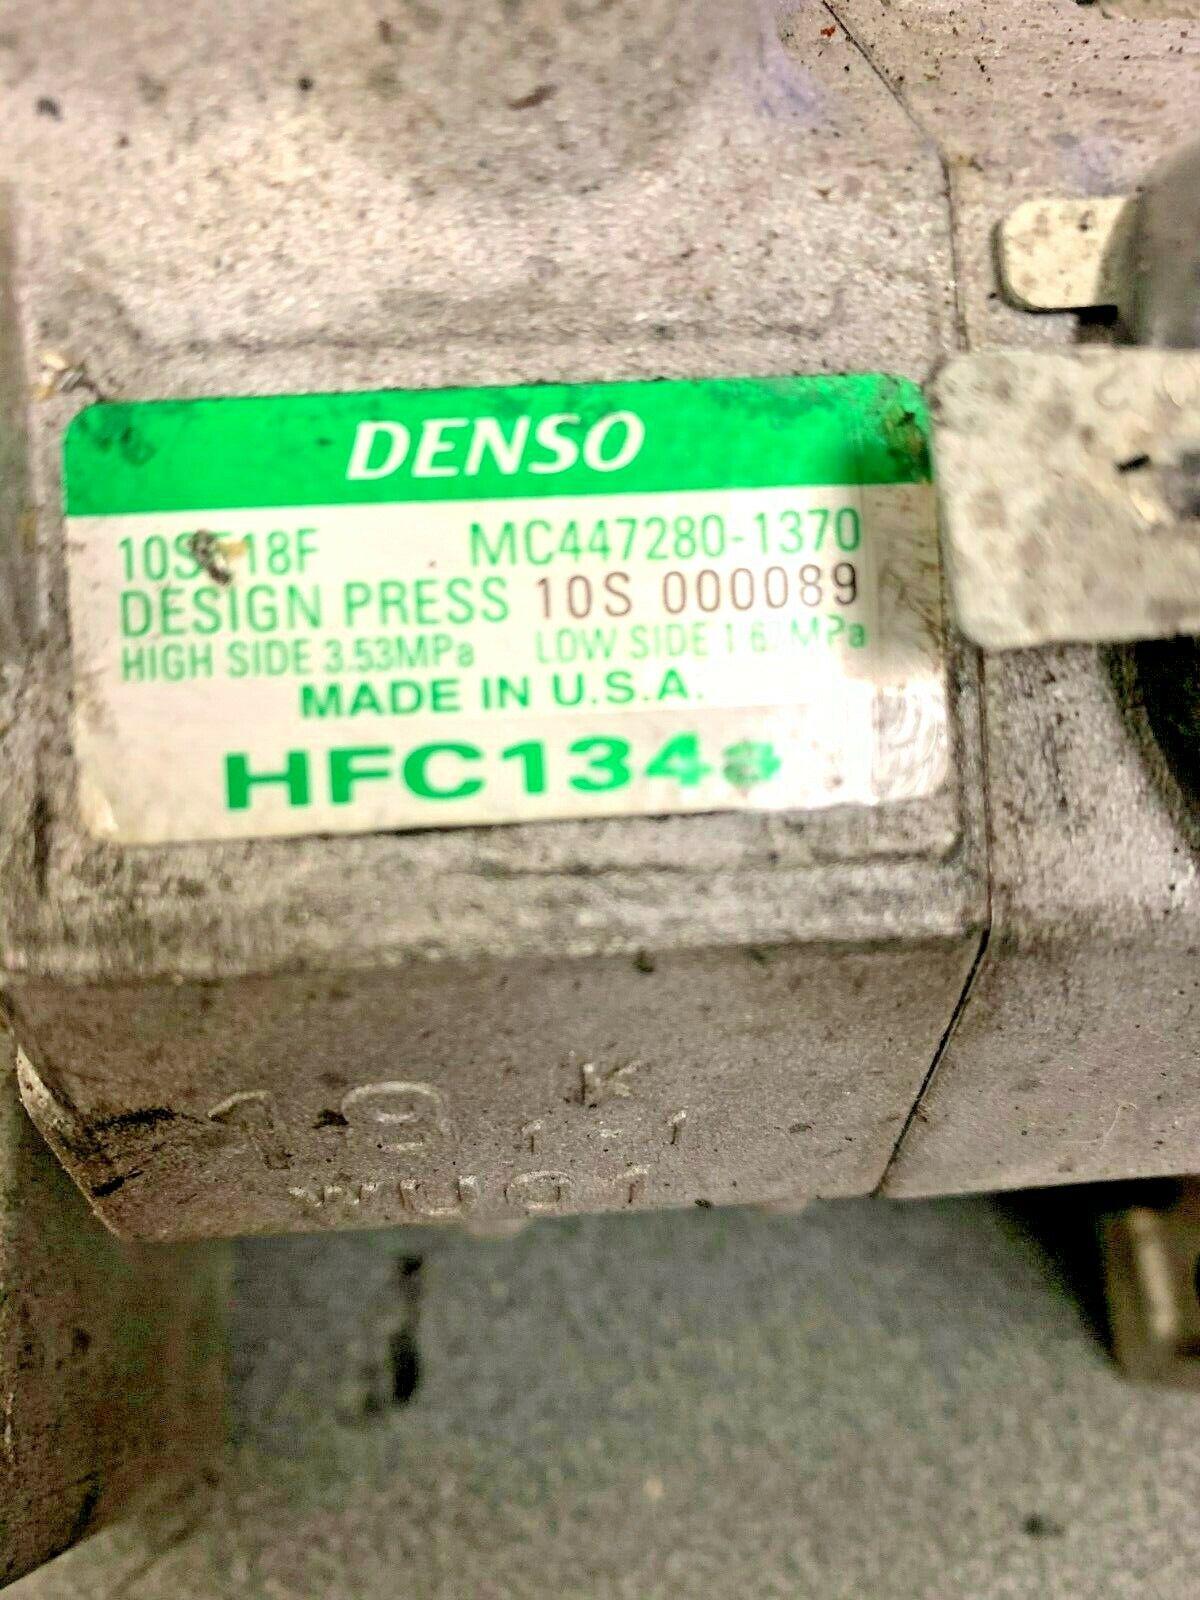 2012-2016 6.6L Duramax Express Savana Denso A//C Compressor 10SE18F MC447280-1370